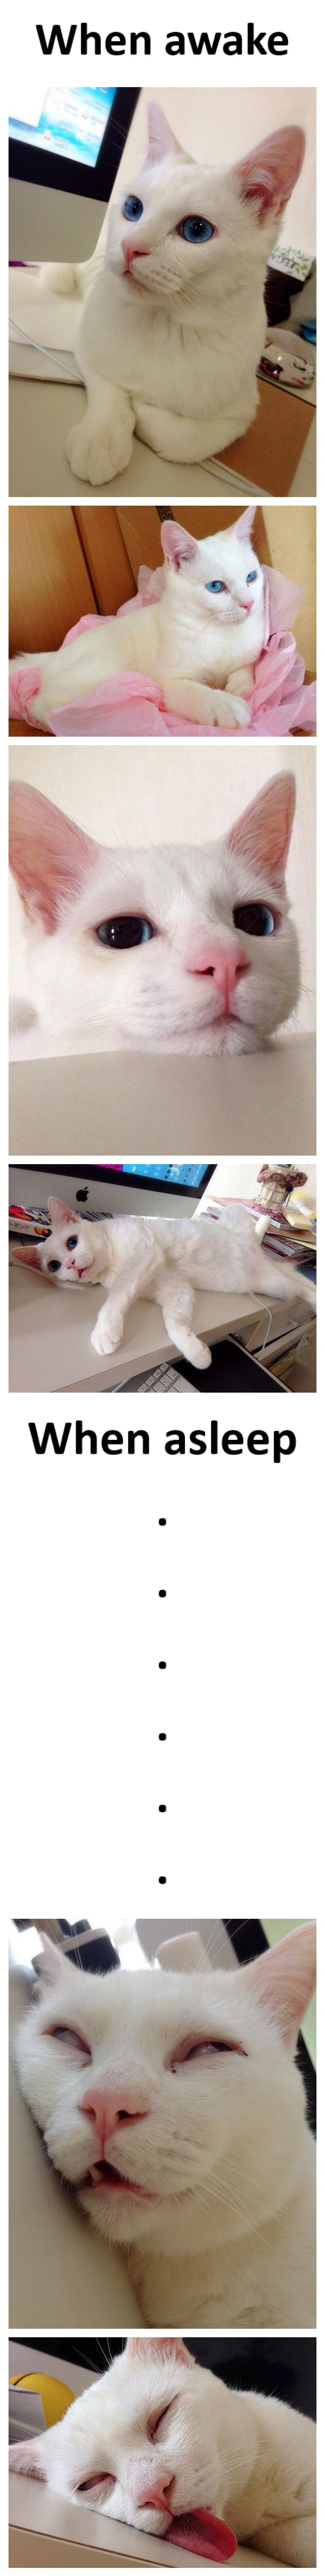 When a gorgeous cat sleeps... BAHAHAHA! So cute though!